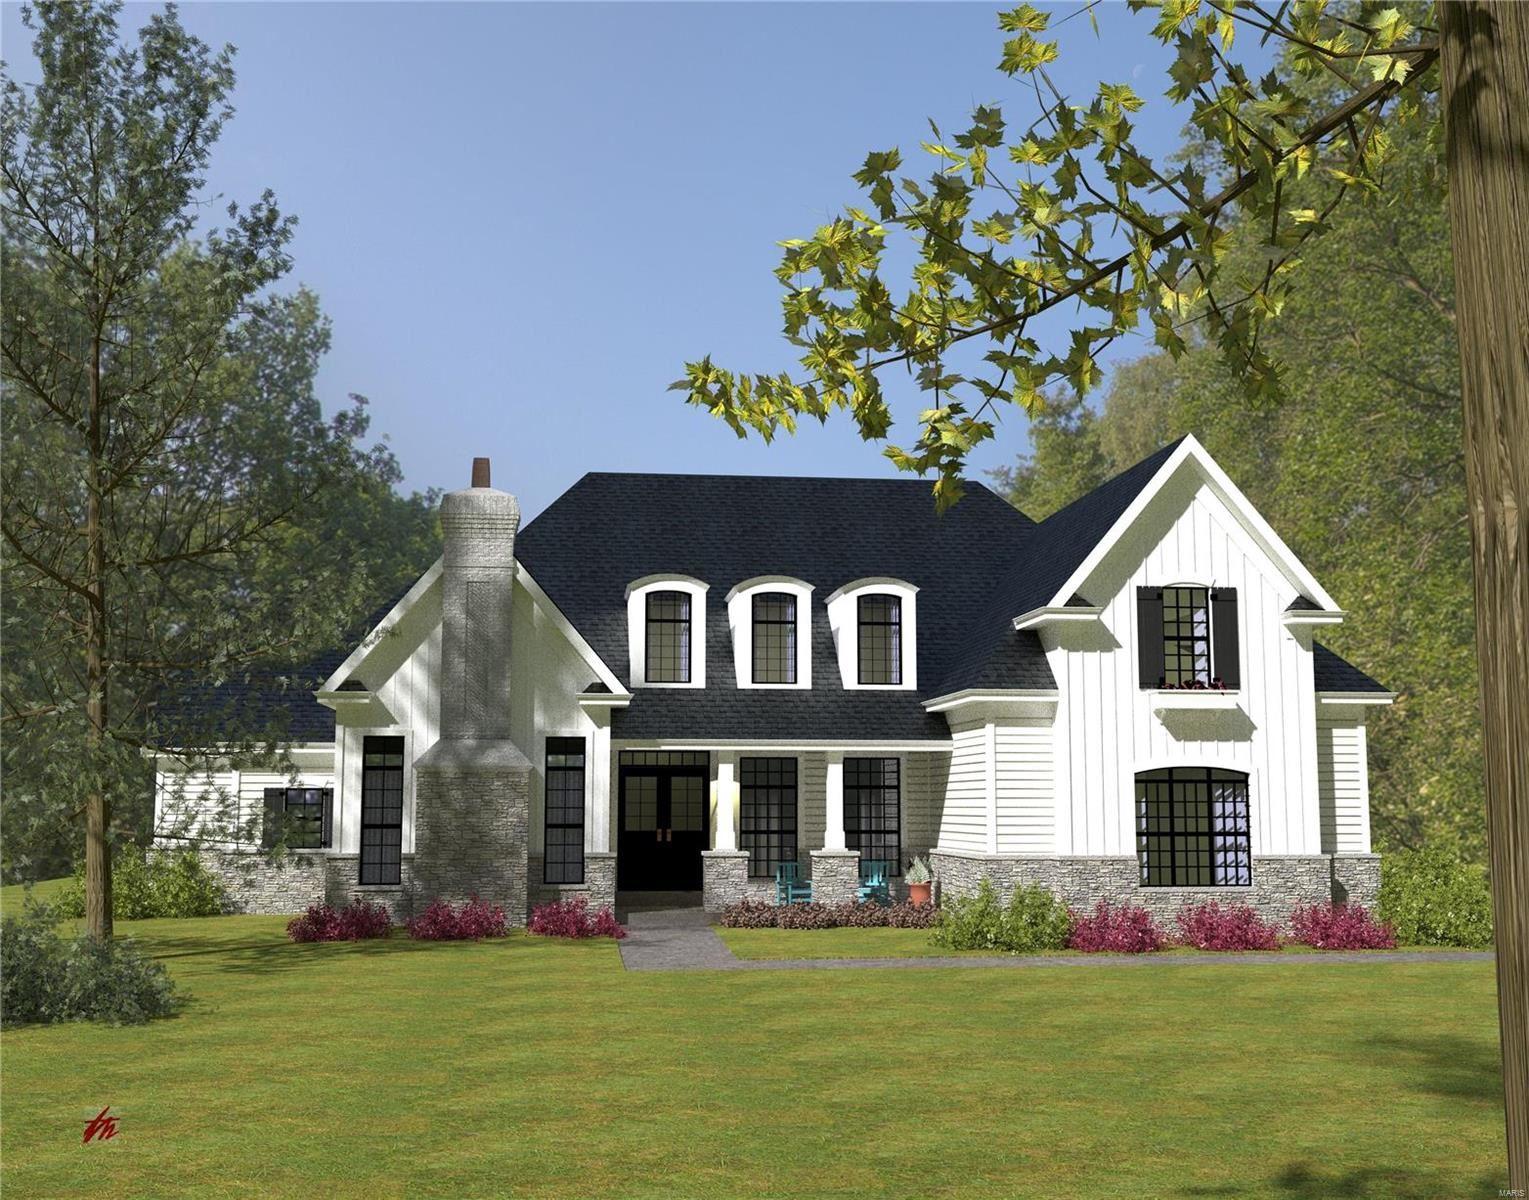 13218 Lochenheath TBB, Town and Country, MO 63131 - MLS#: 21044566